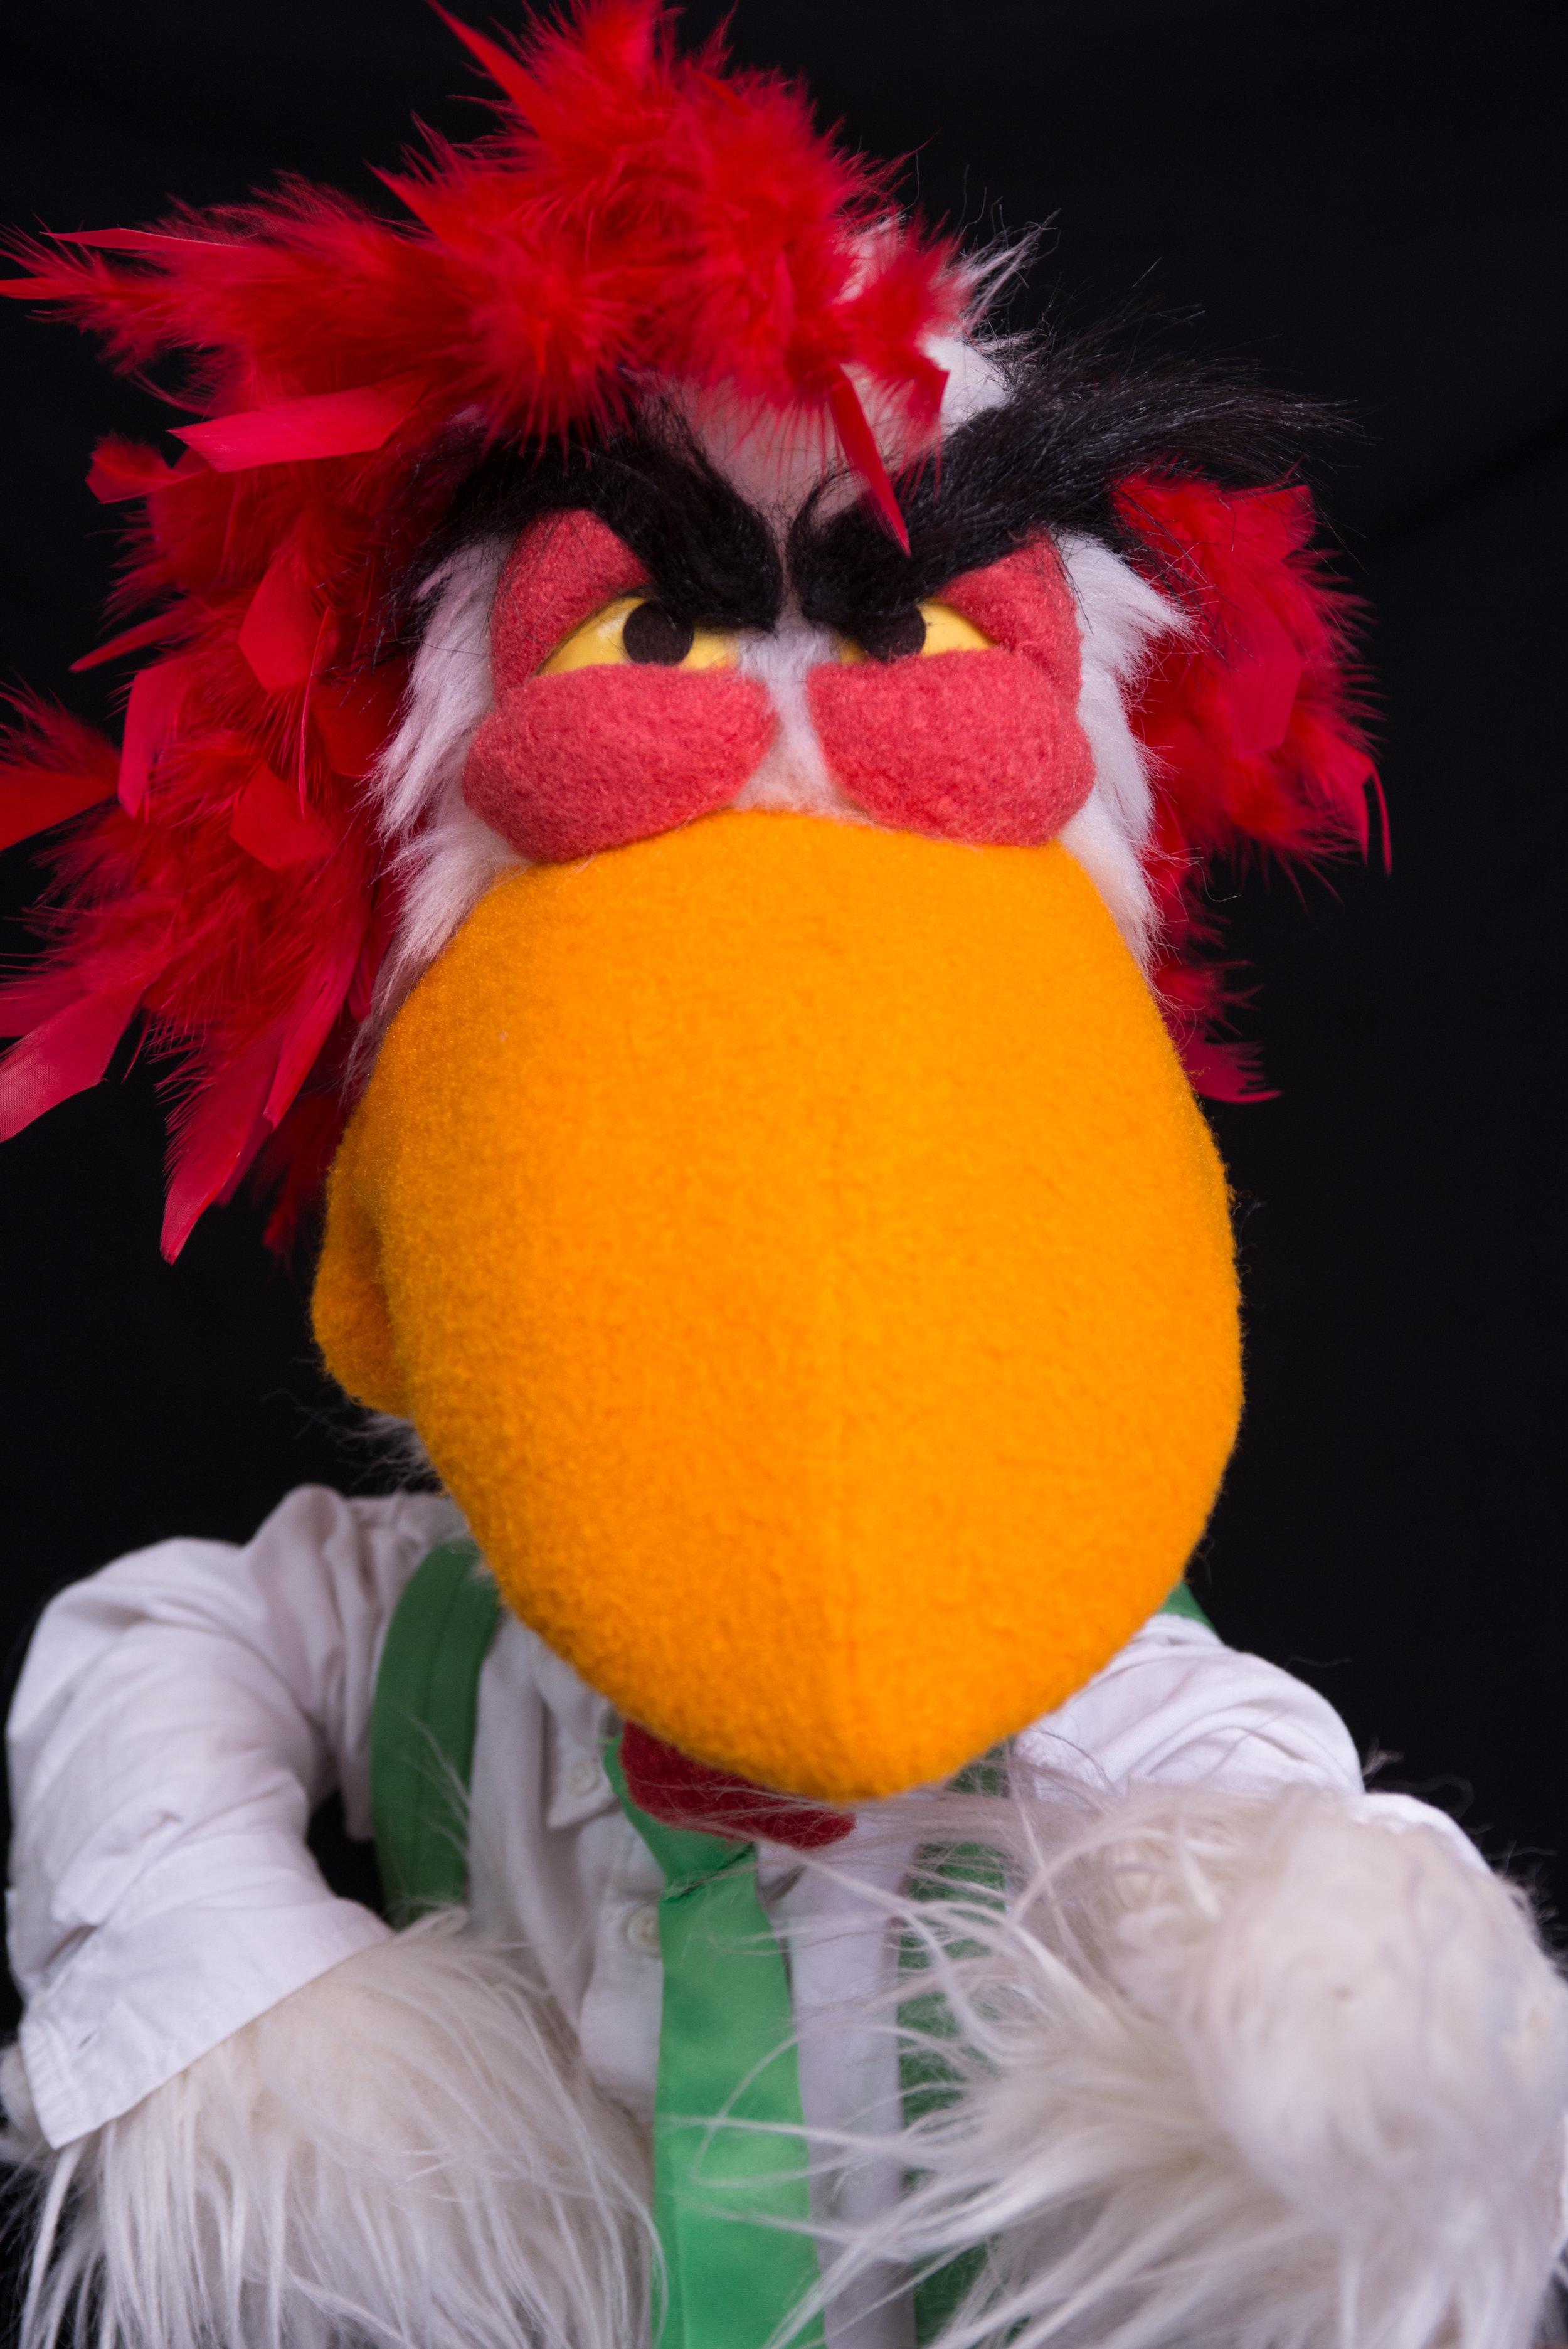 Mr. Chicker